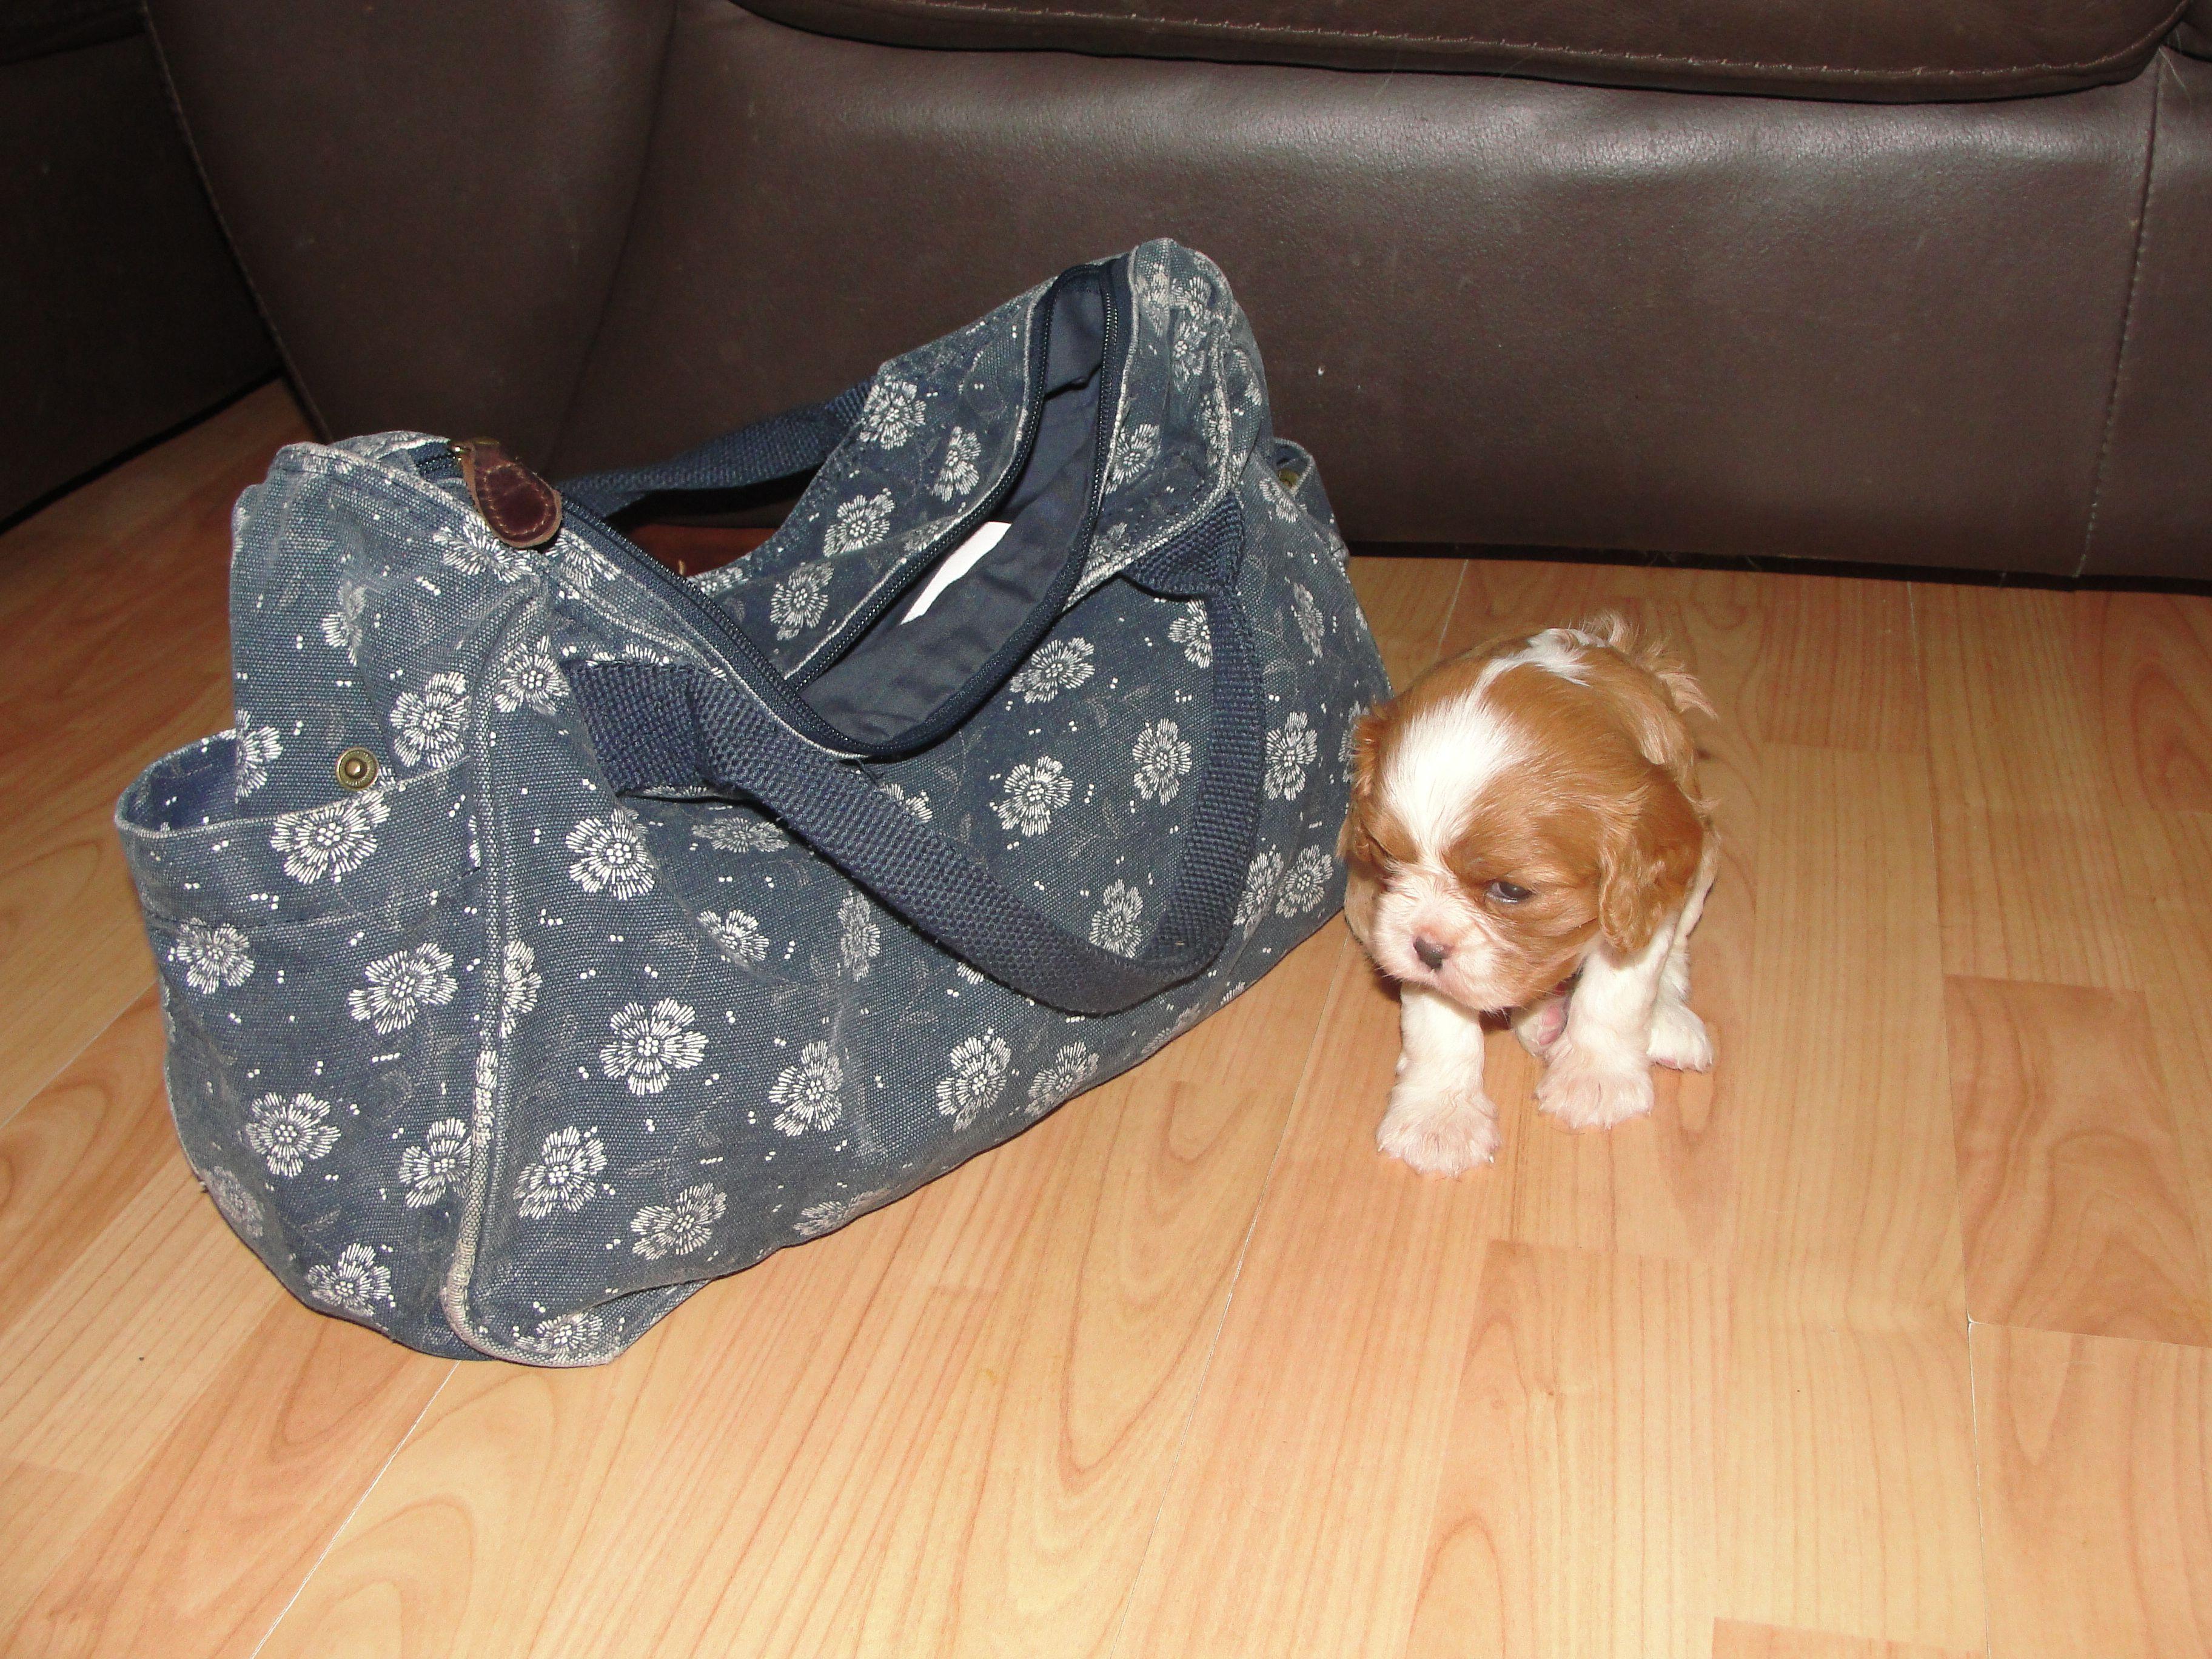 4 Week Old Hairy Baby Next To My Handbag So Tiny Cavalier King Charles Spaniel King Charles Cavalier King Charles Charles Spaniel